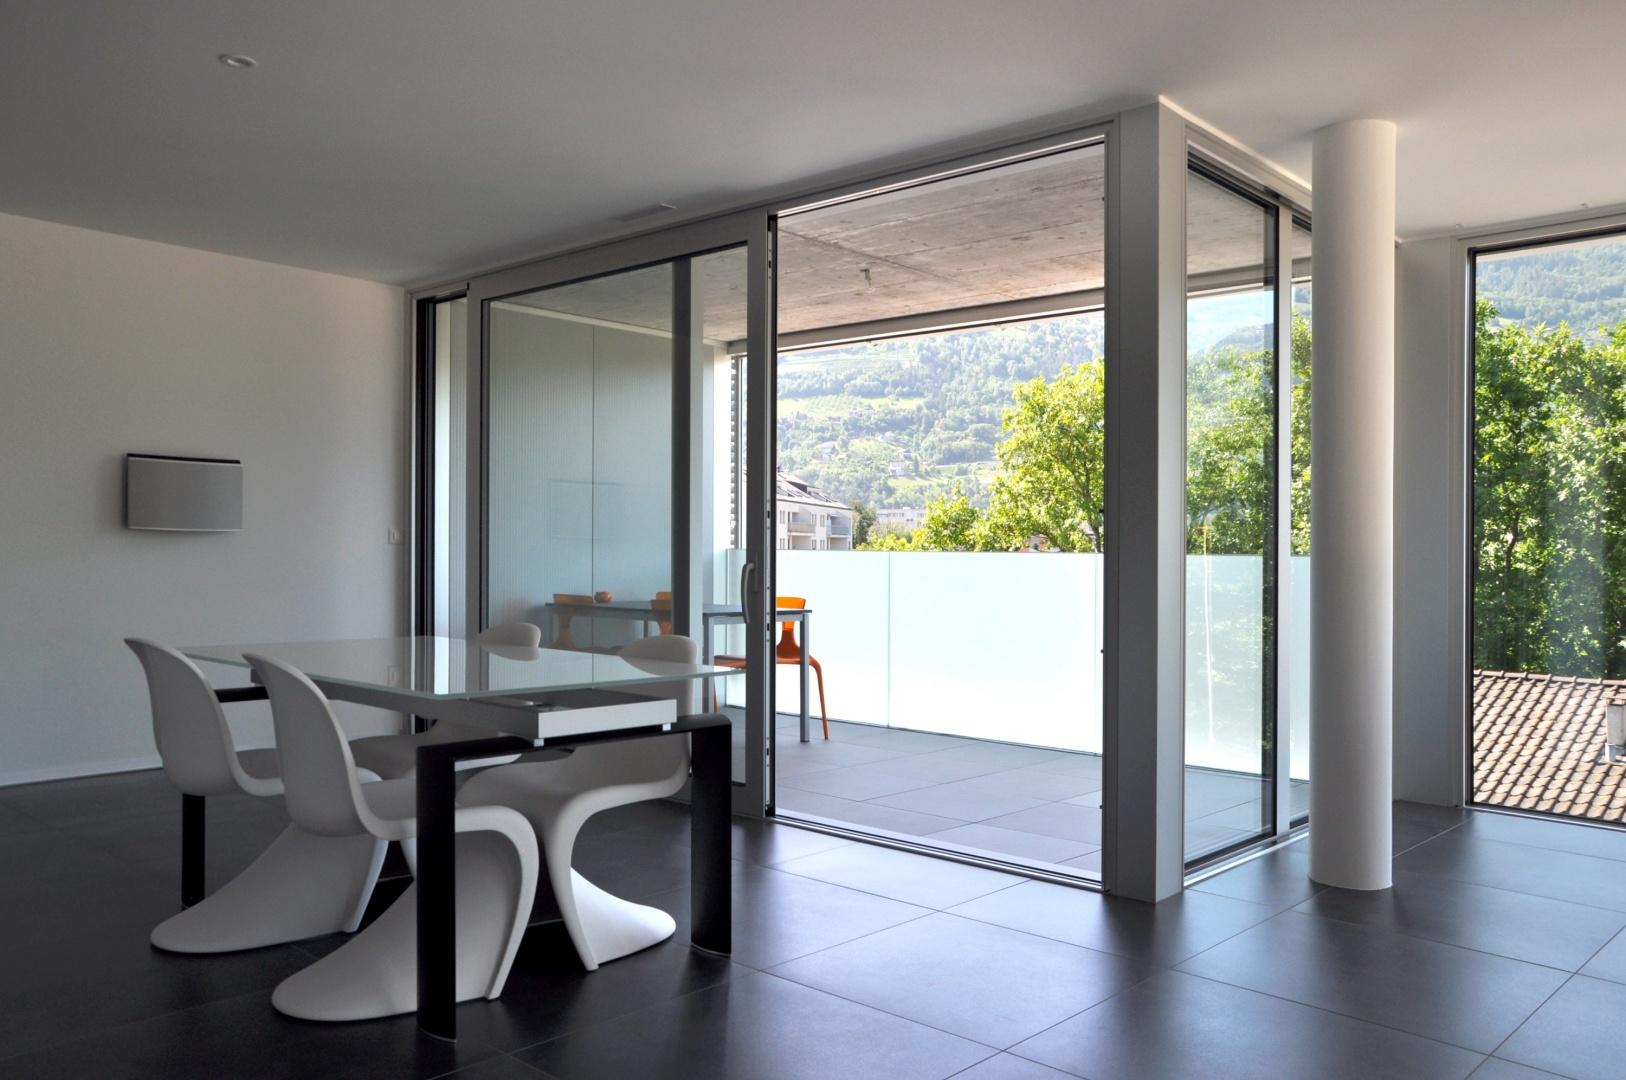 Innenansicht 1 Wohnung © Savioz & Di Berardino architectes